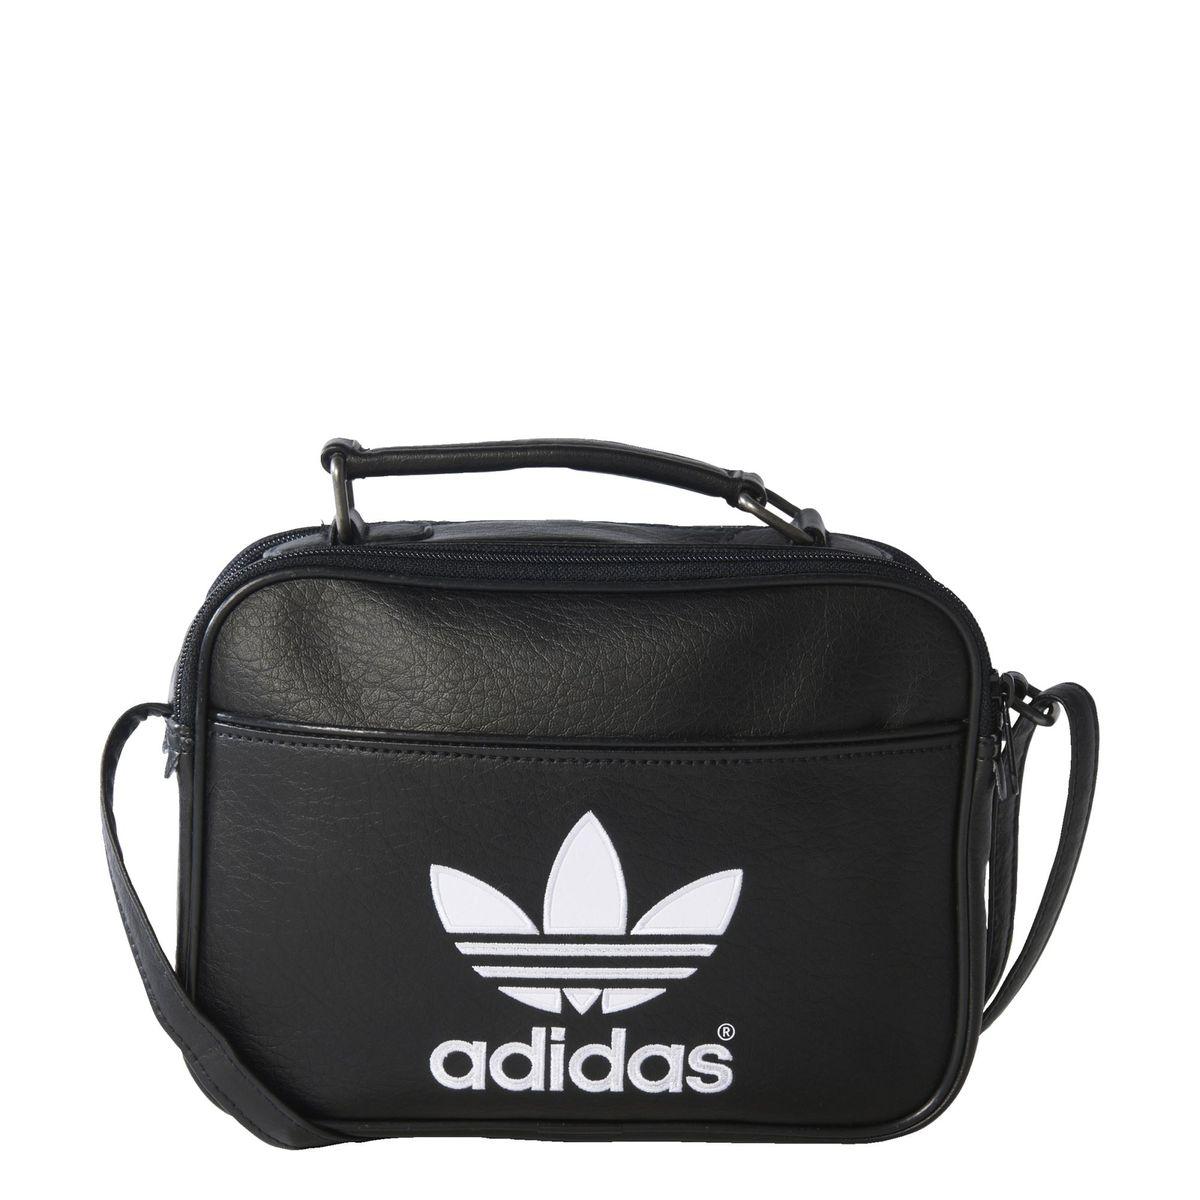 adidas femmes mini airline bag catgorie sacs bandoulires